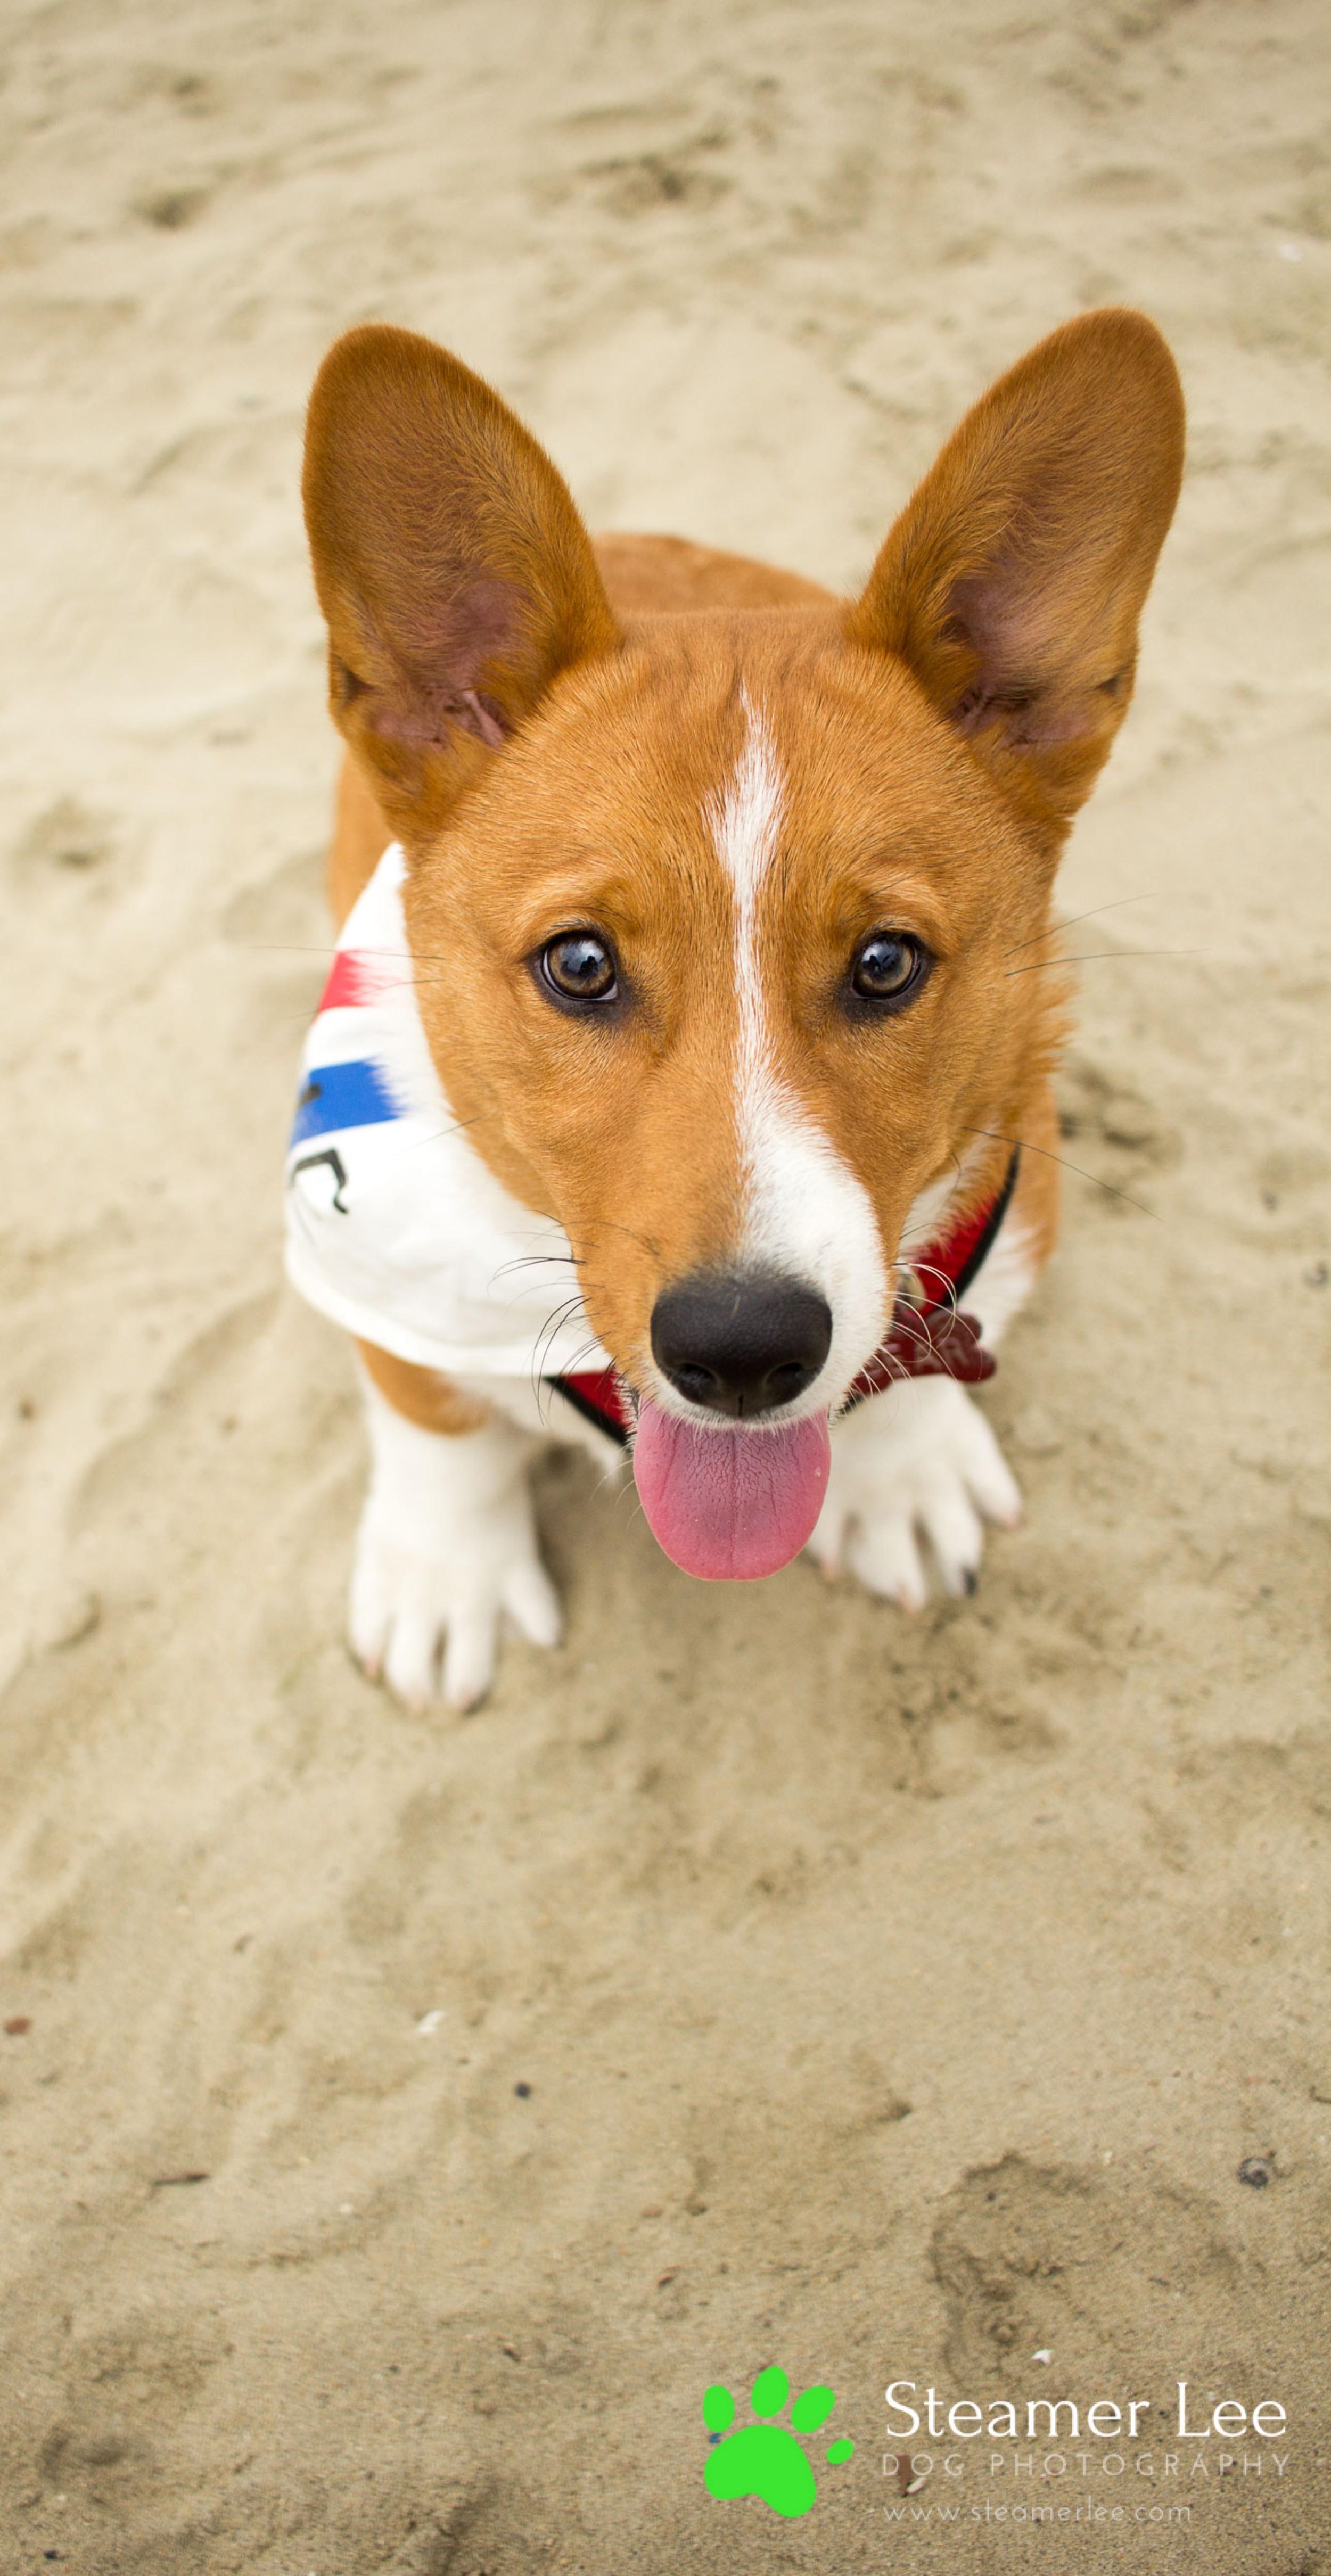 Steamer Lee Dog Photography - July 2017 So Cal Corgi Beach Day - Vol. 3 - 43.jpg